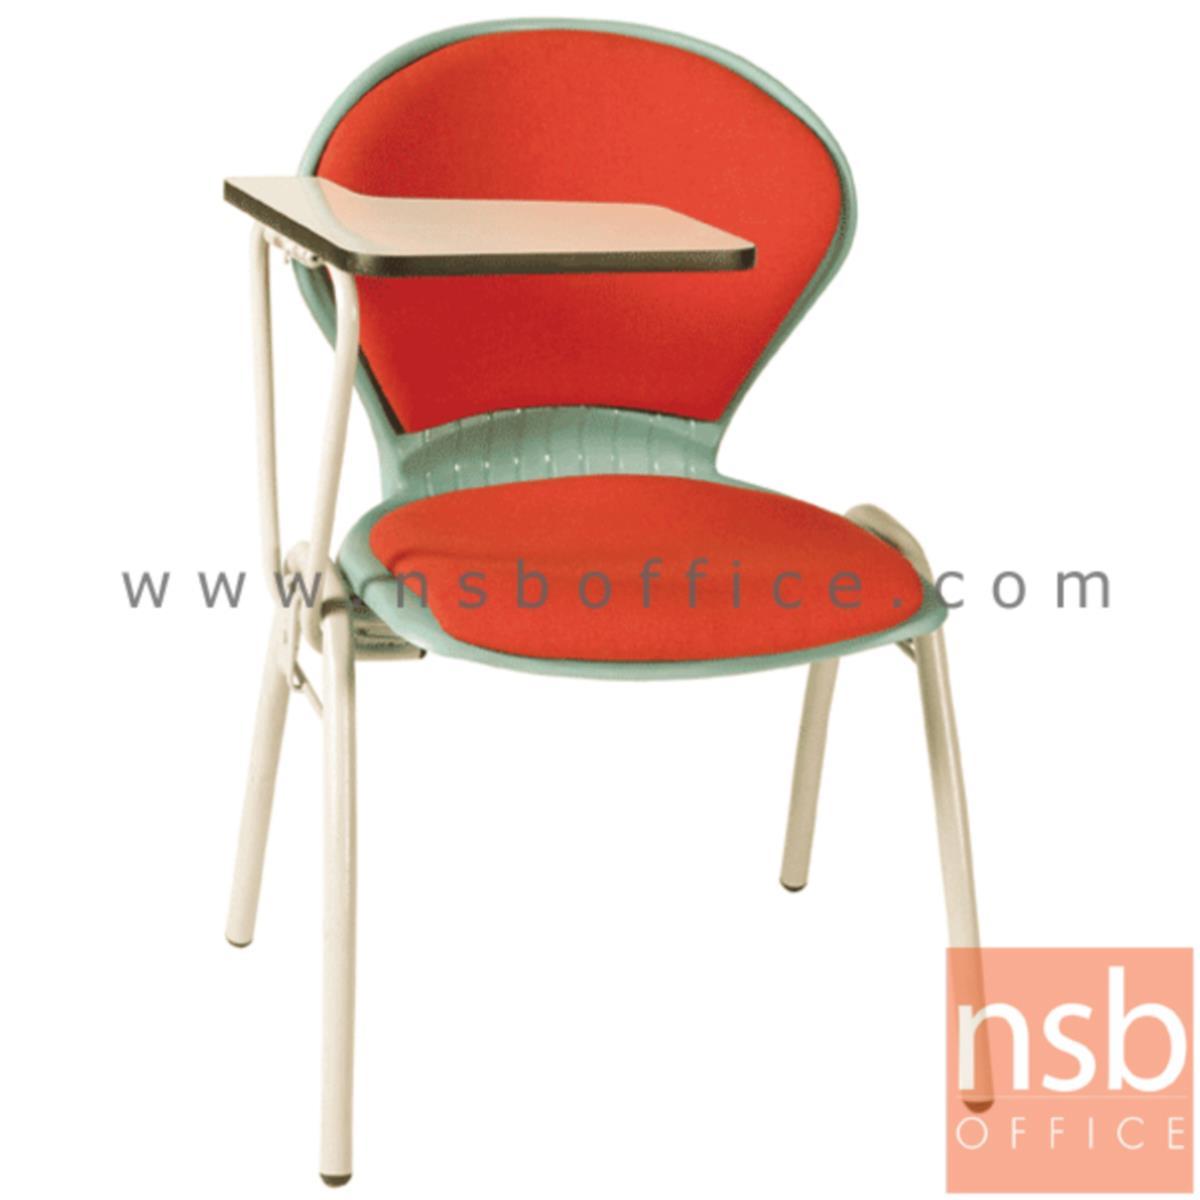 B07A054:เก้าอี้เลคเชอร์เฟรมโพลี่ รุ่น C176-566 ขาเหล็กพ่นสี